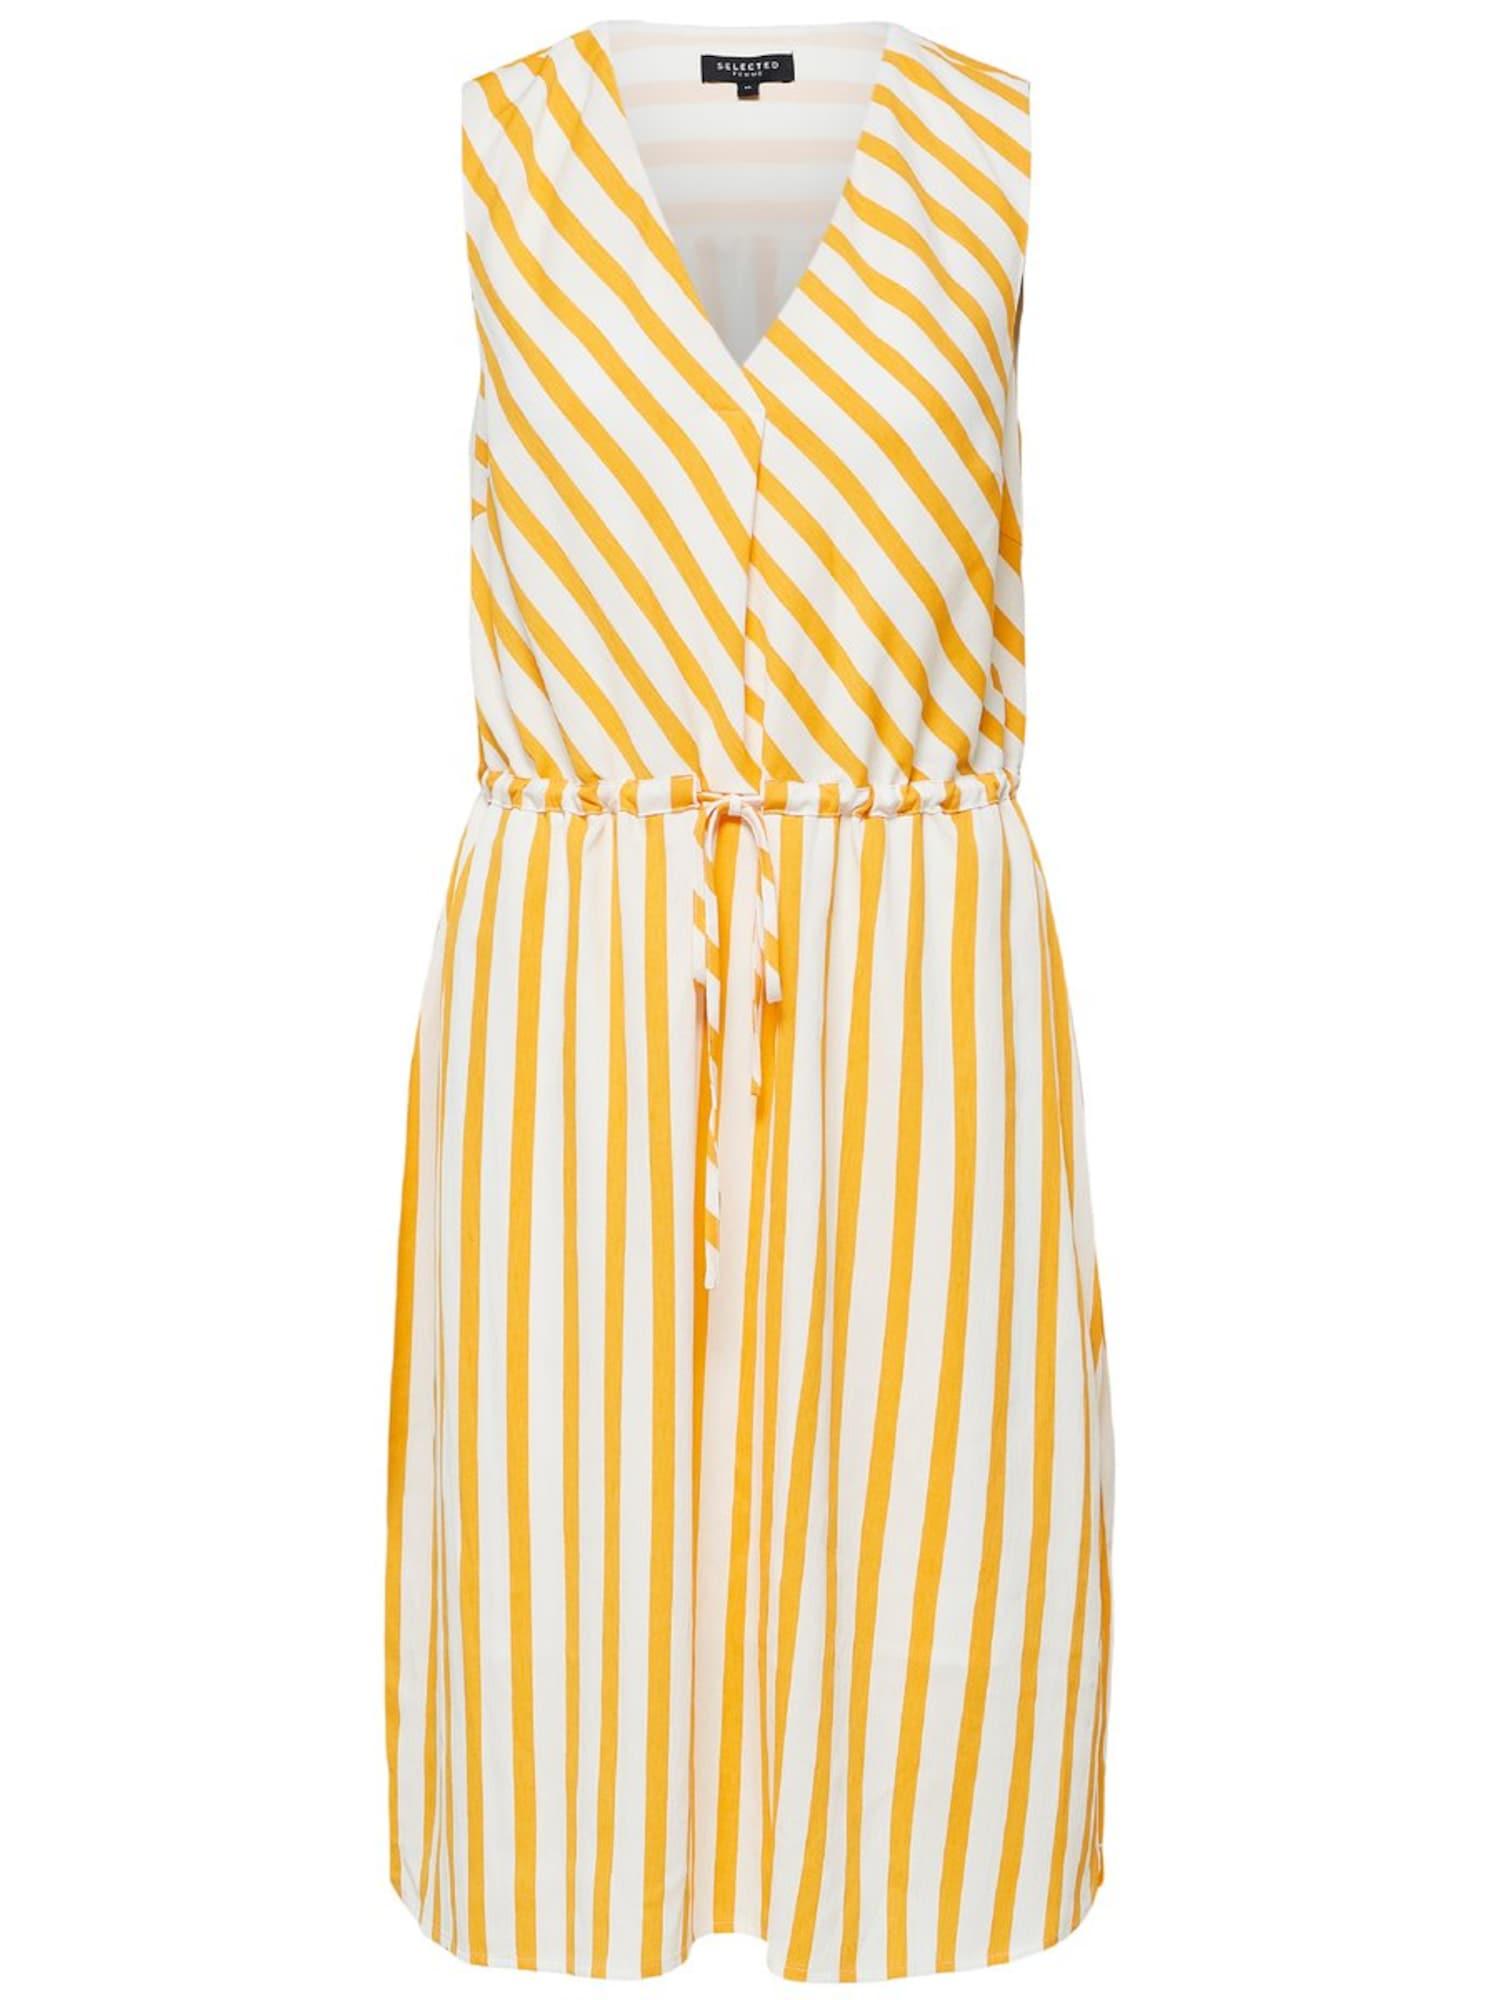 Letní šaty žlutá bílá SELECTED FEMME